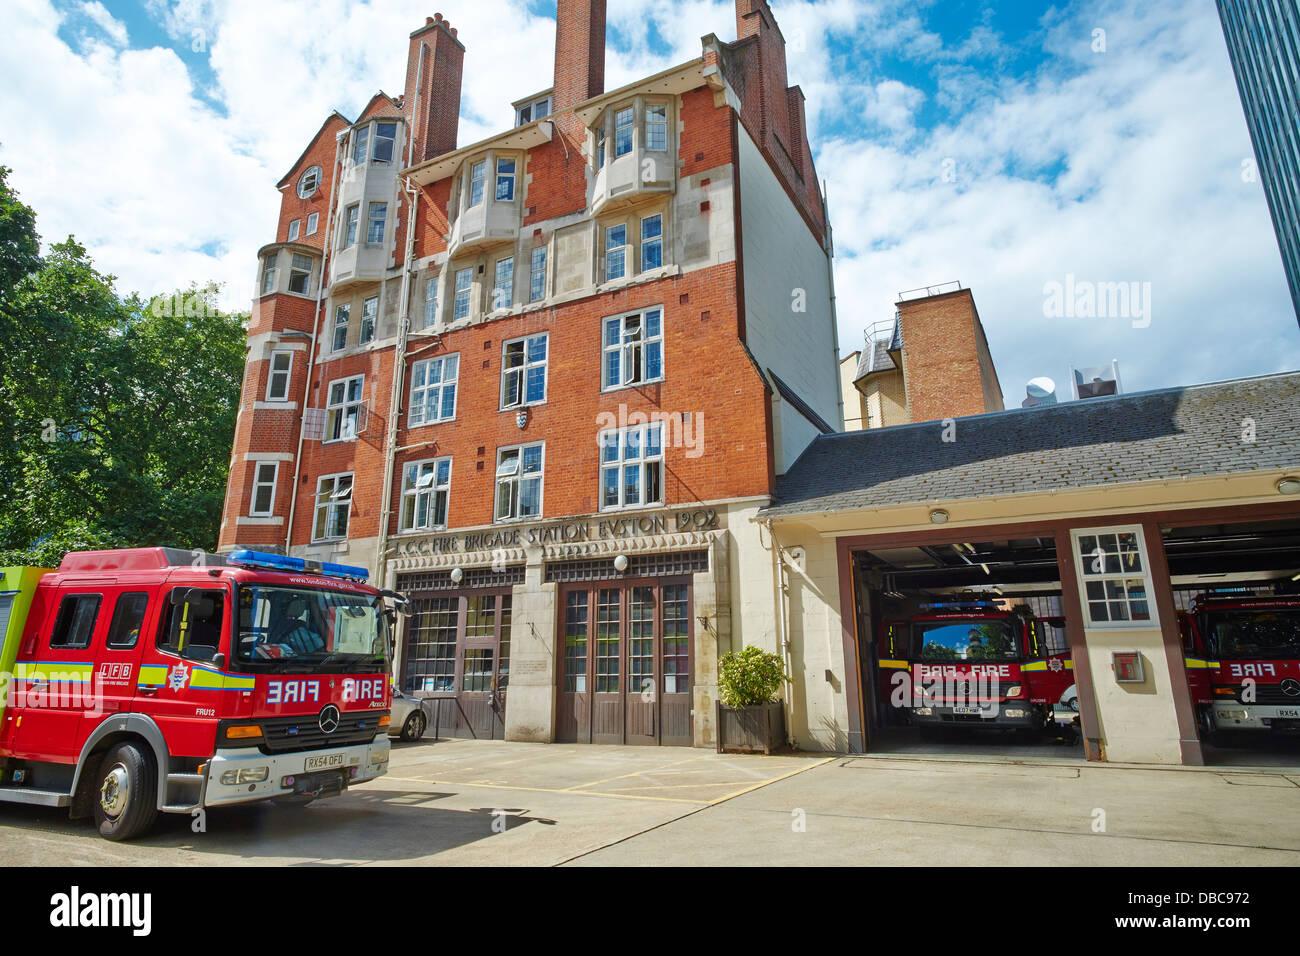 LCC Fire Brigade Station Euston Road London UK - Stock Image